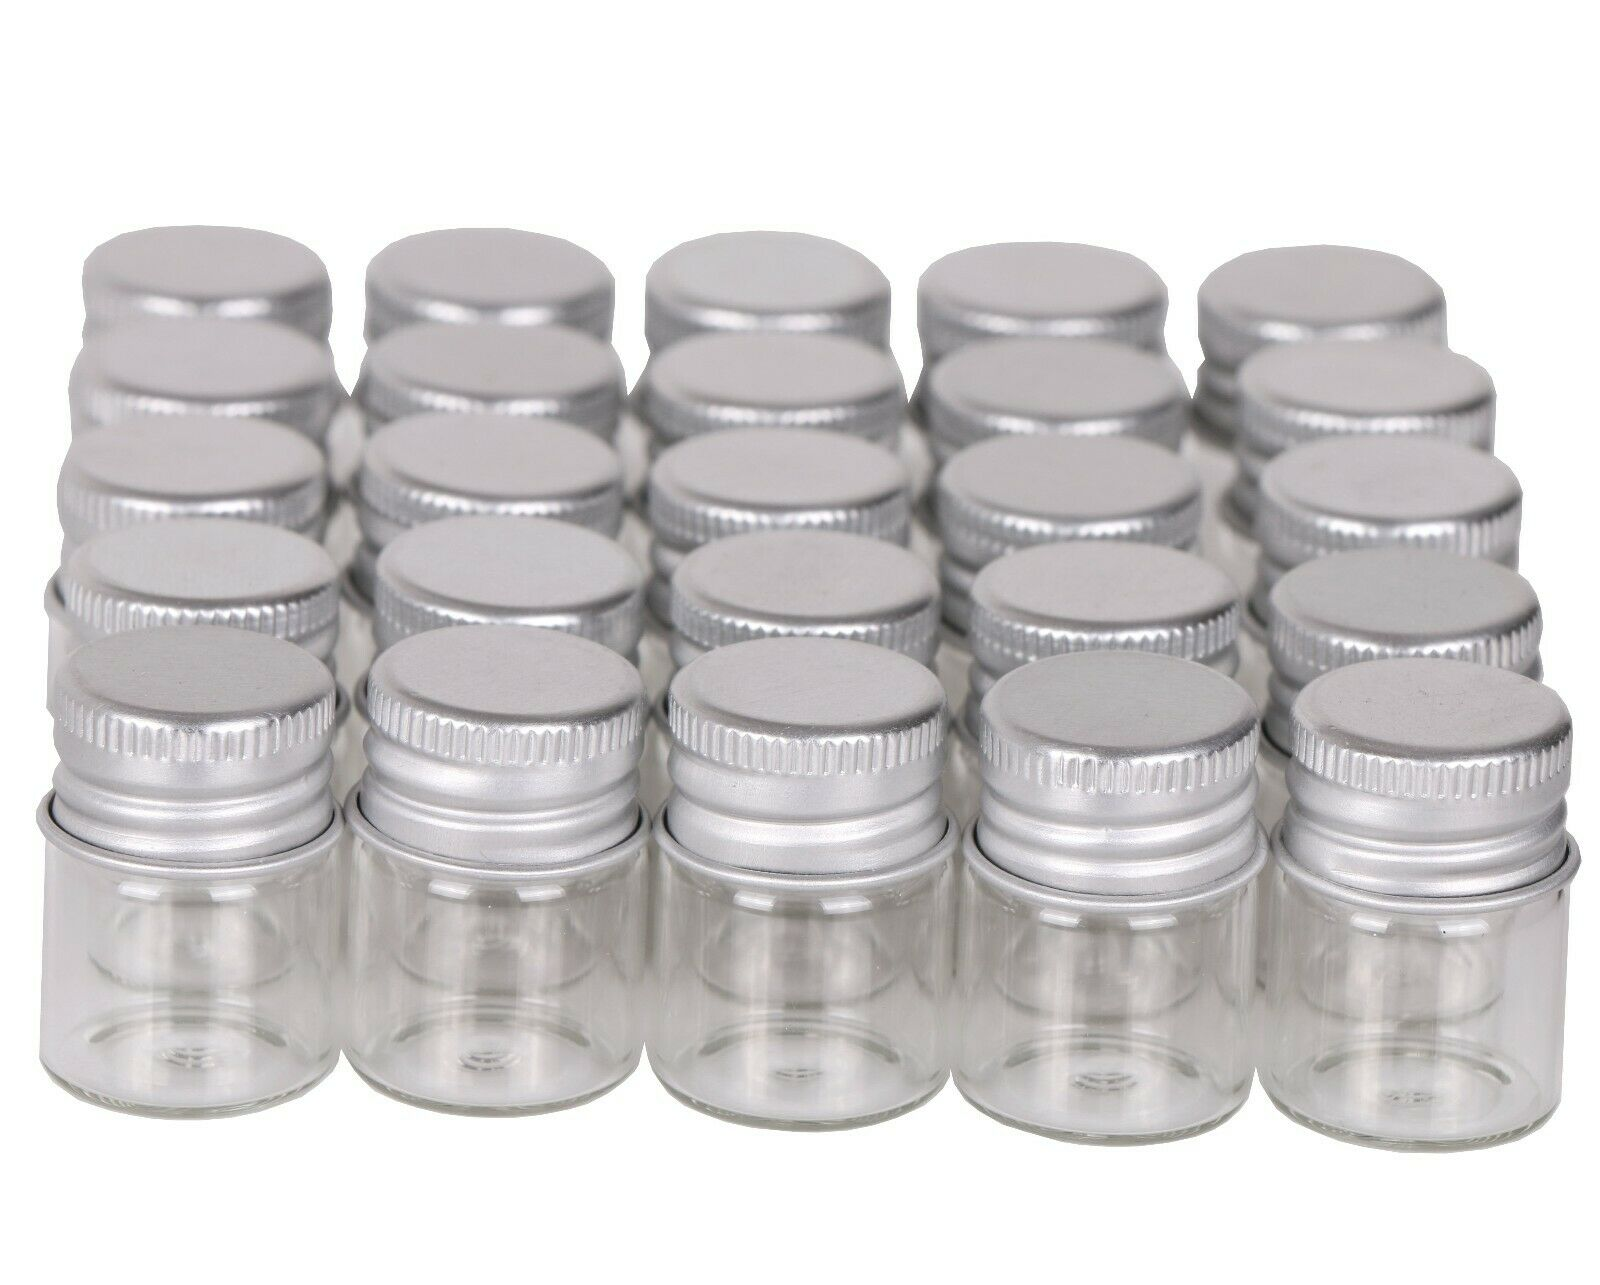 100pcs Tiny Vials 5ml Small Glass Bottles Mini Jars with Alu